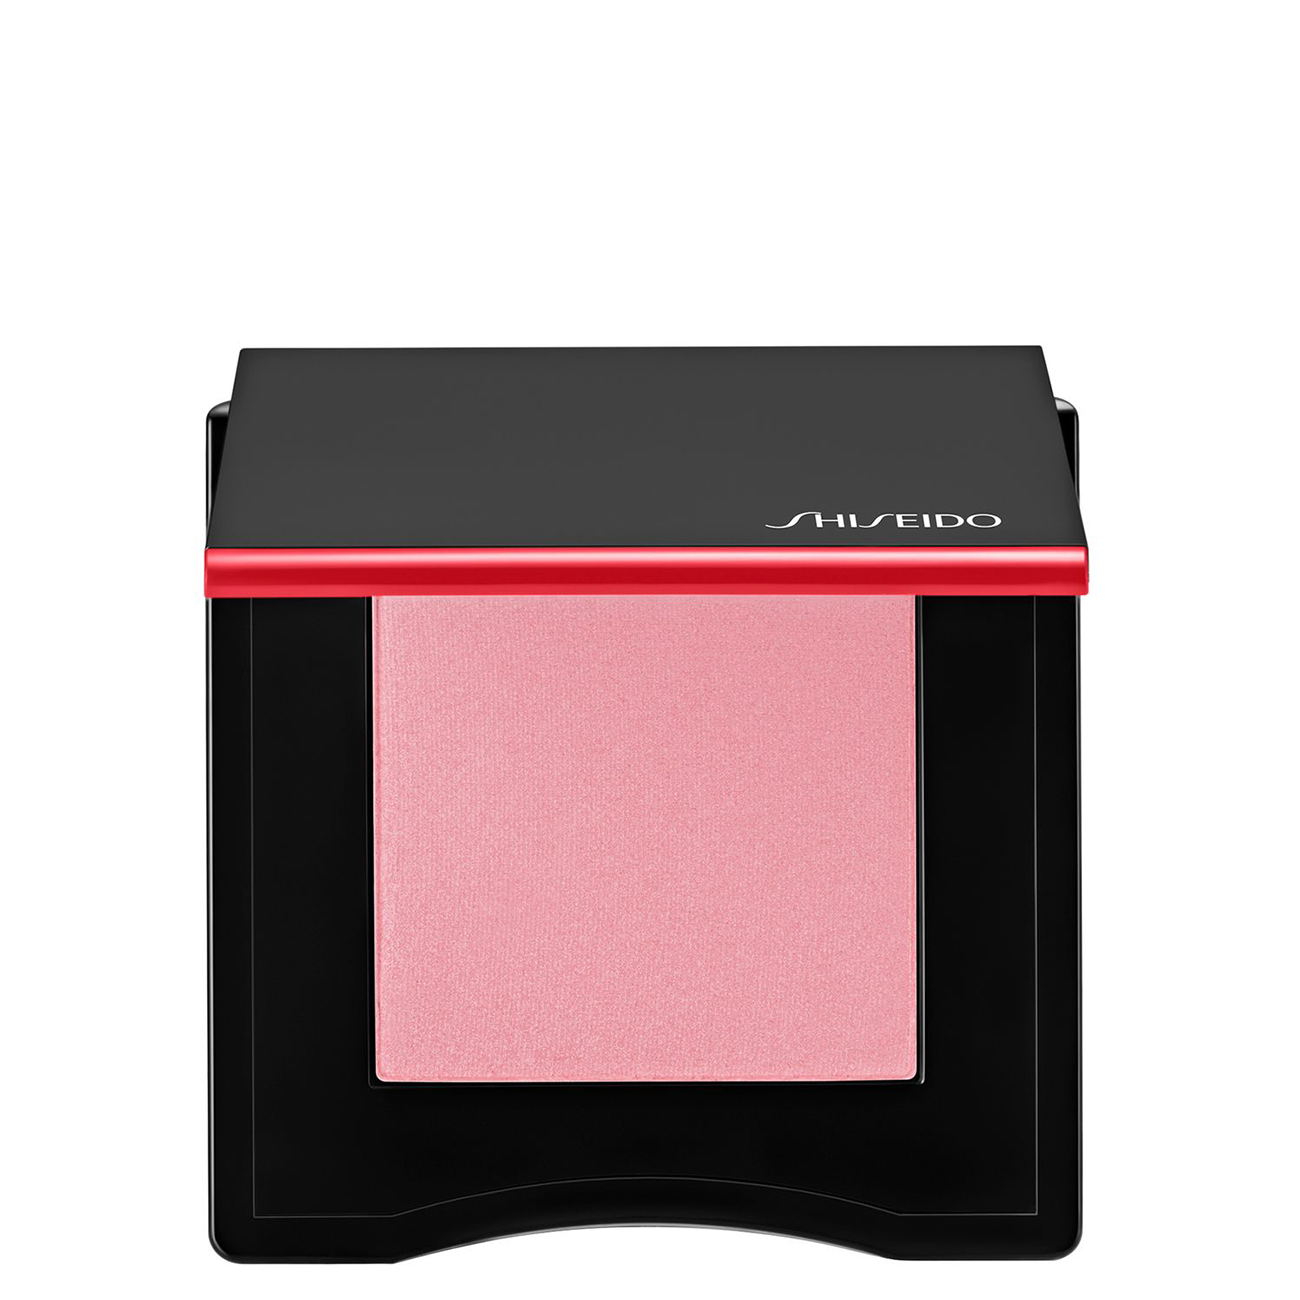 Innerglow Cheek Powder 02 3.5gr Shiseido imagine 2021 bestvalue.eu